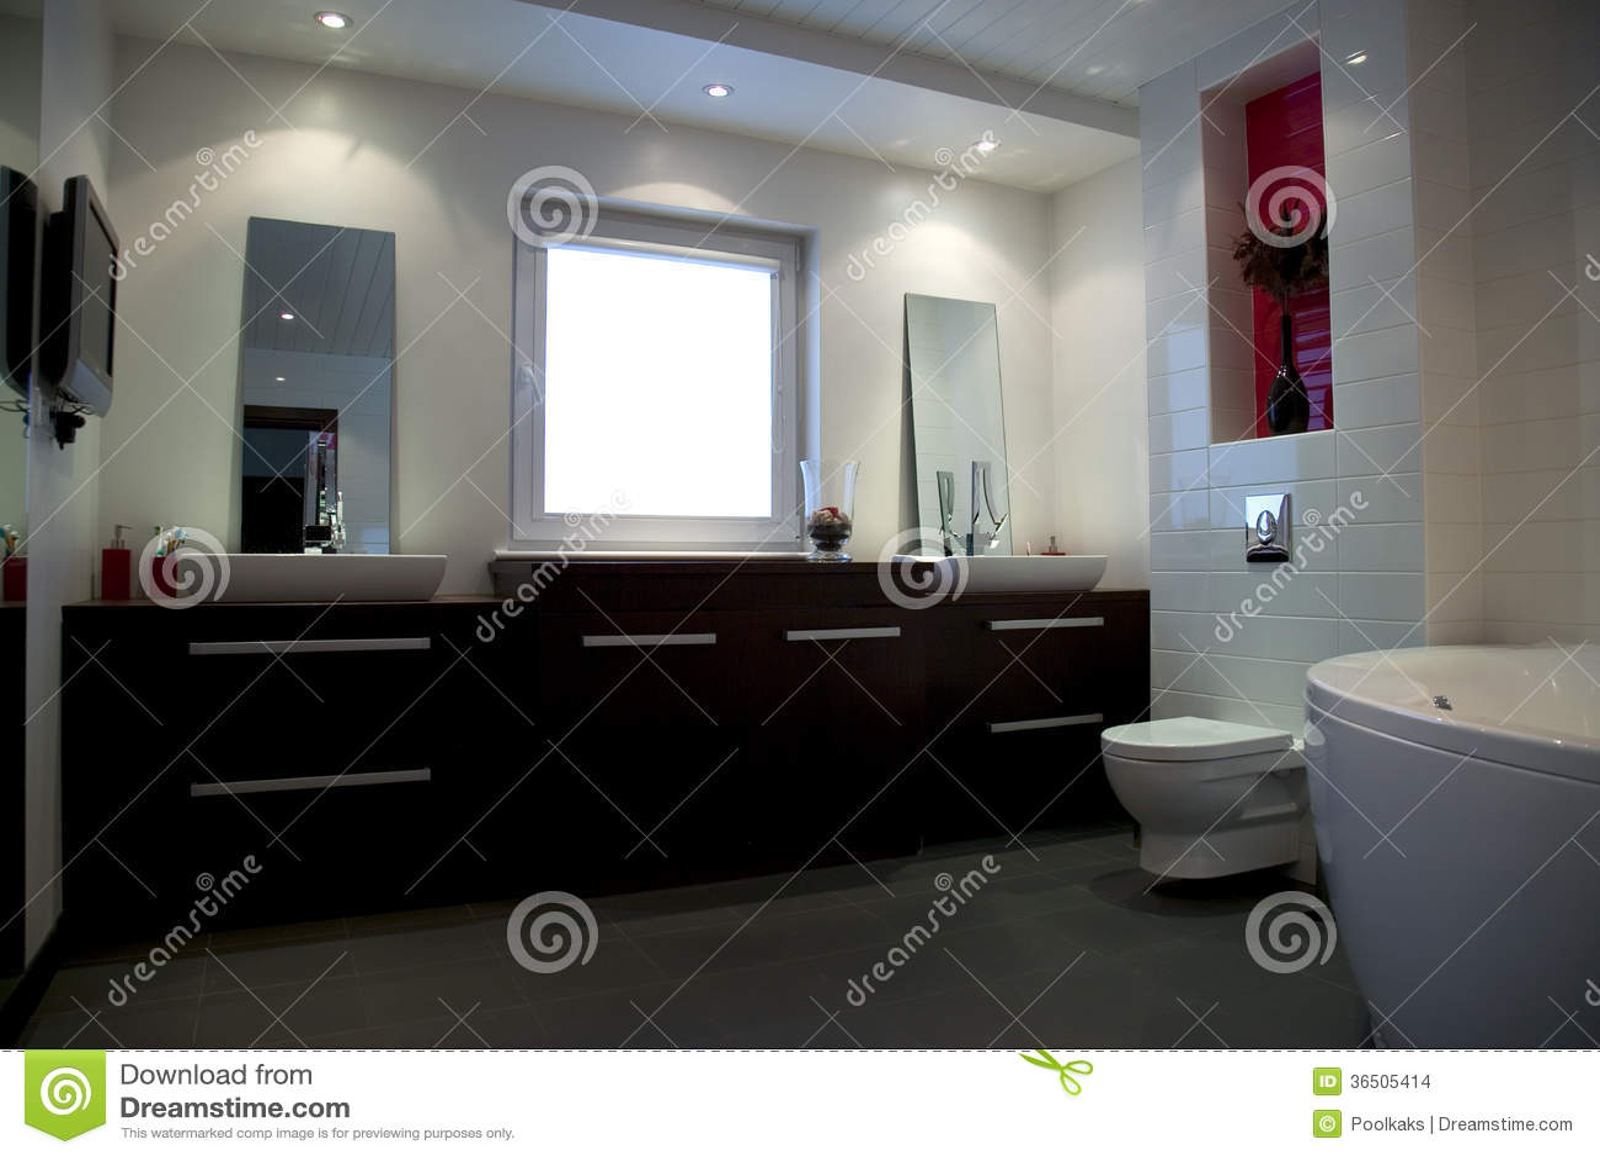 Modernt vitt badrum med brunt möblemang arkivbilder   bild: 36505414